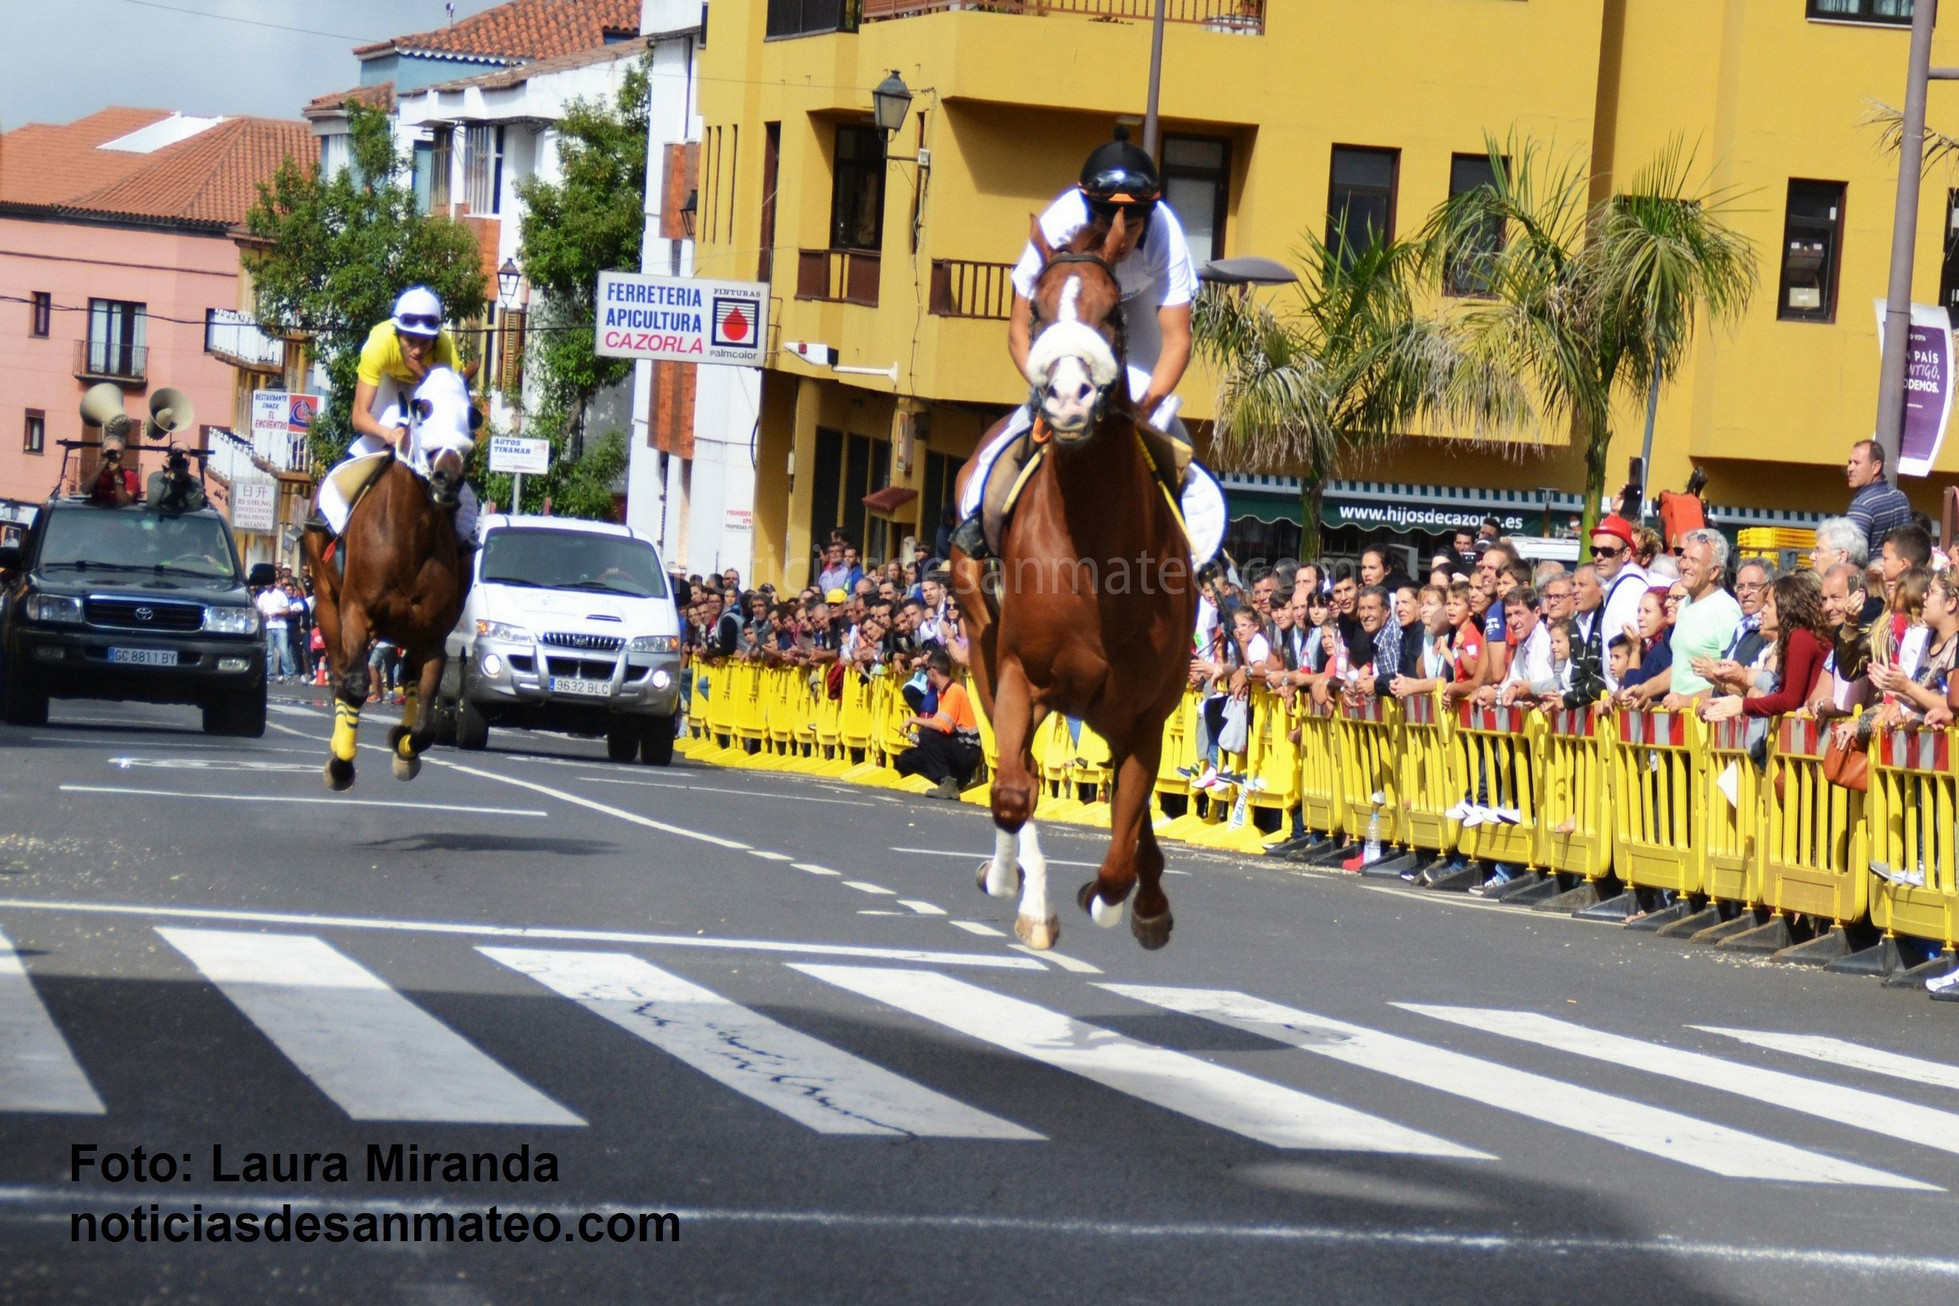 carreras caballos agricultor san mateo julio 2016DSC 14931